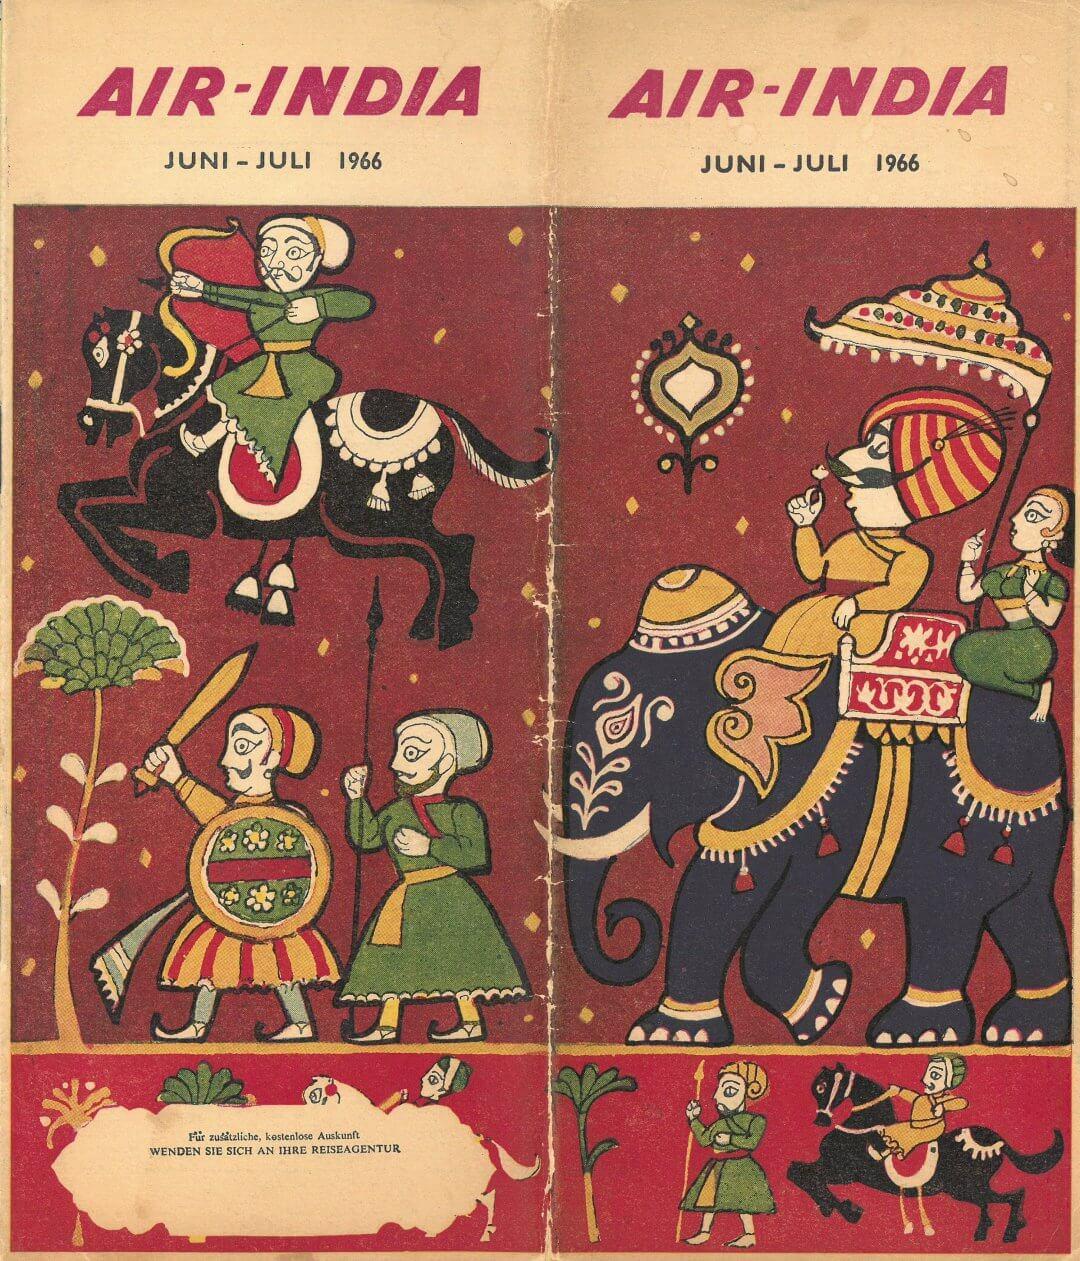 Air Inia 1966 Timetable